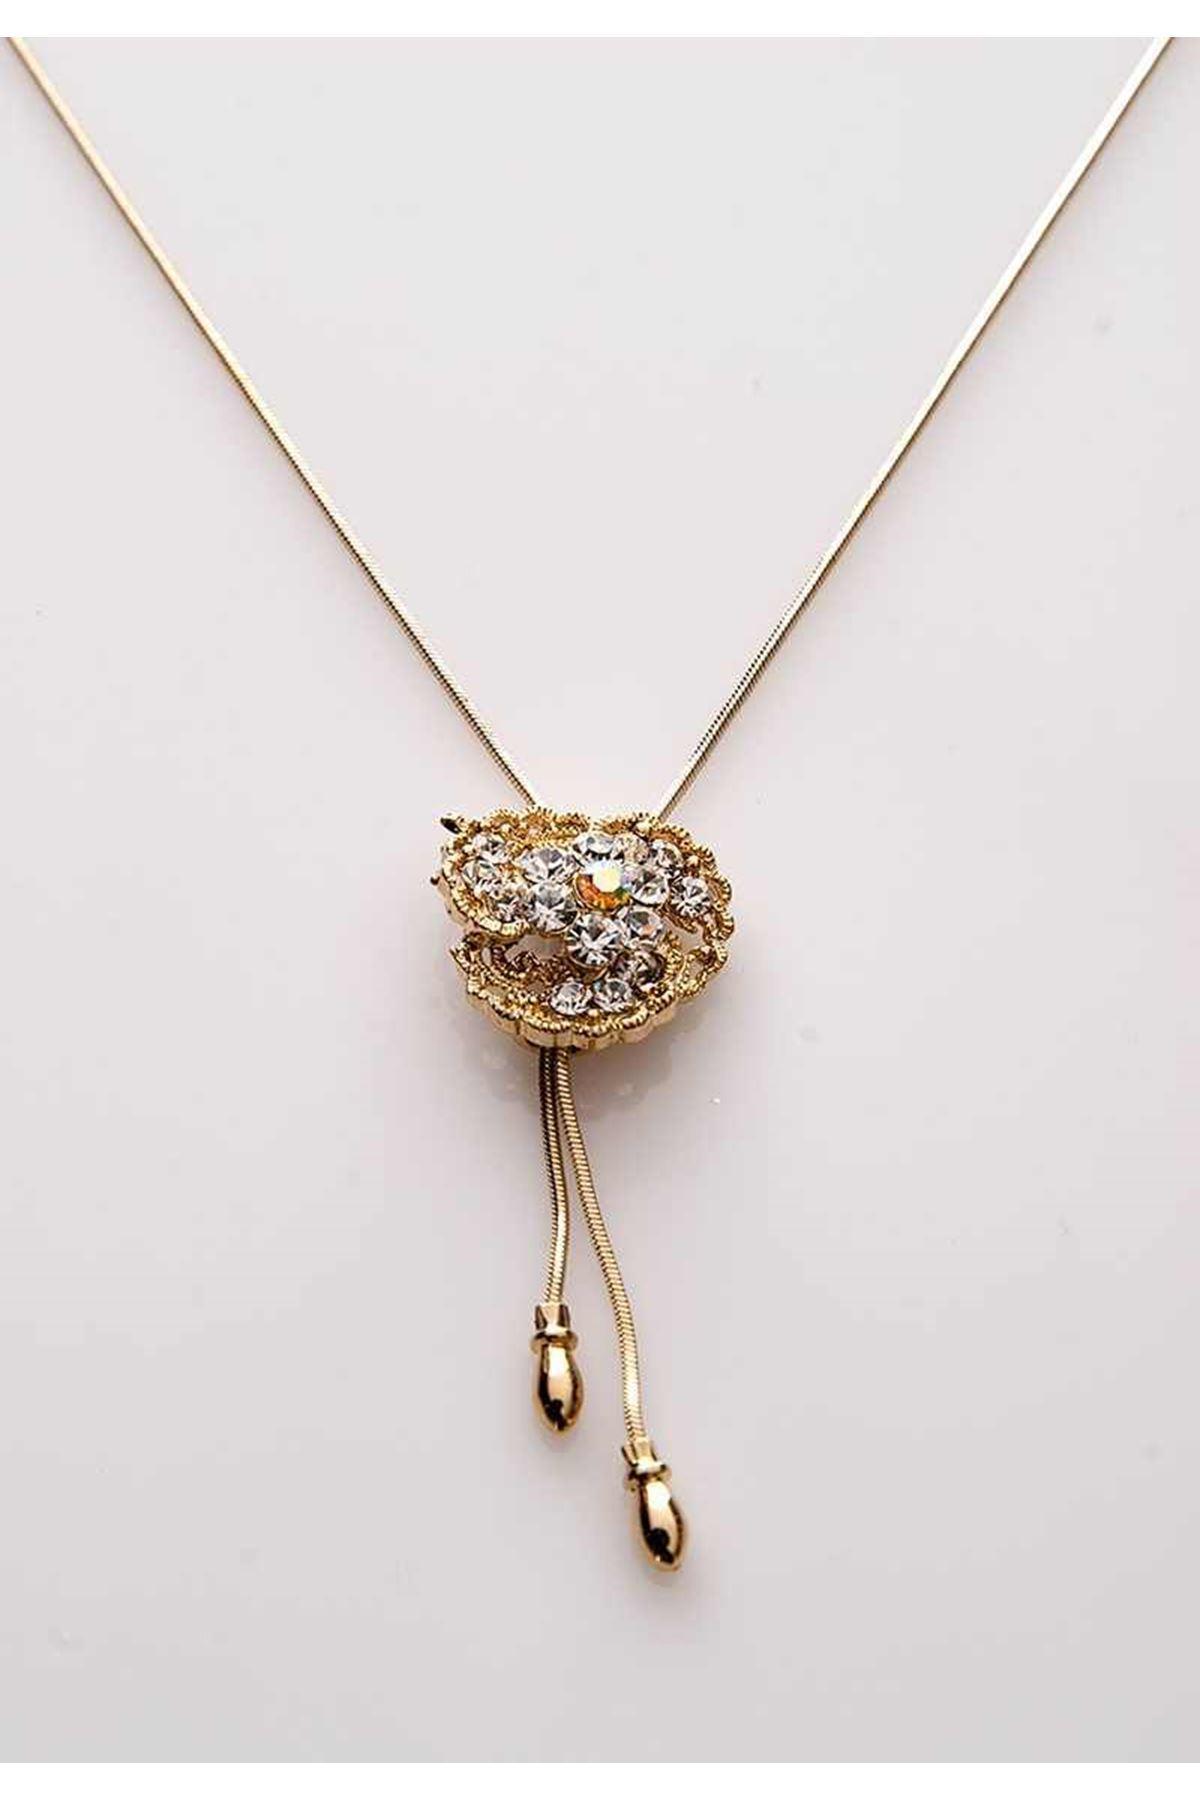 Gold Taşlı Kolye 11Ç-107830